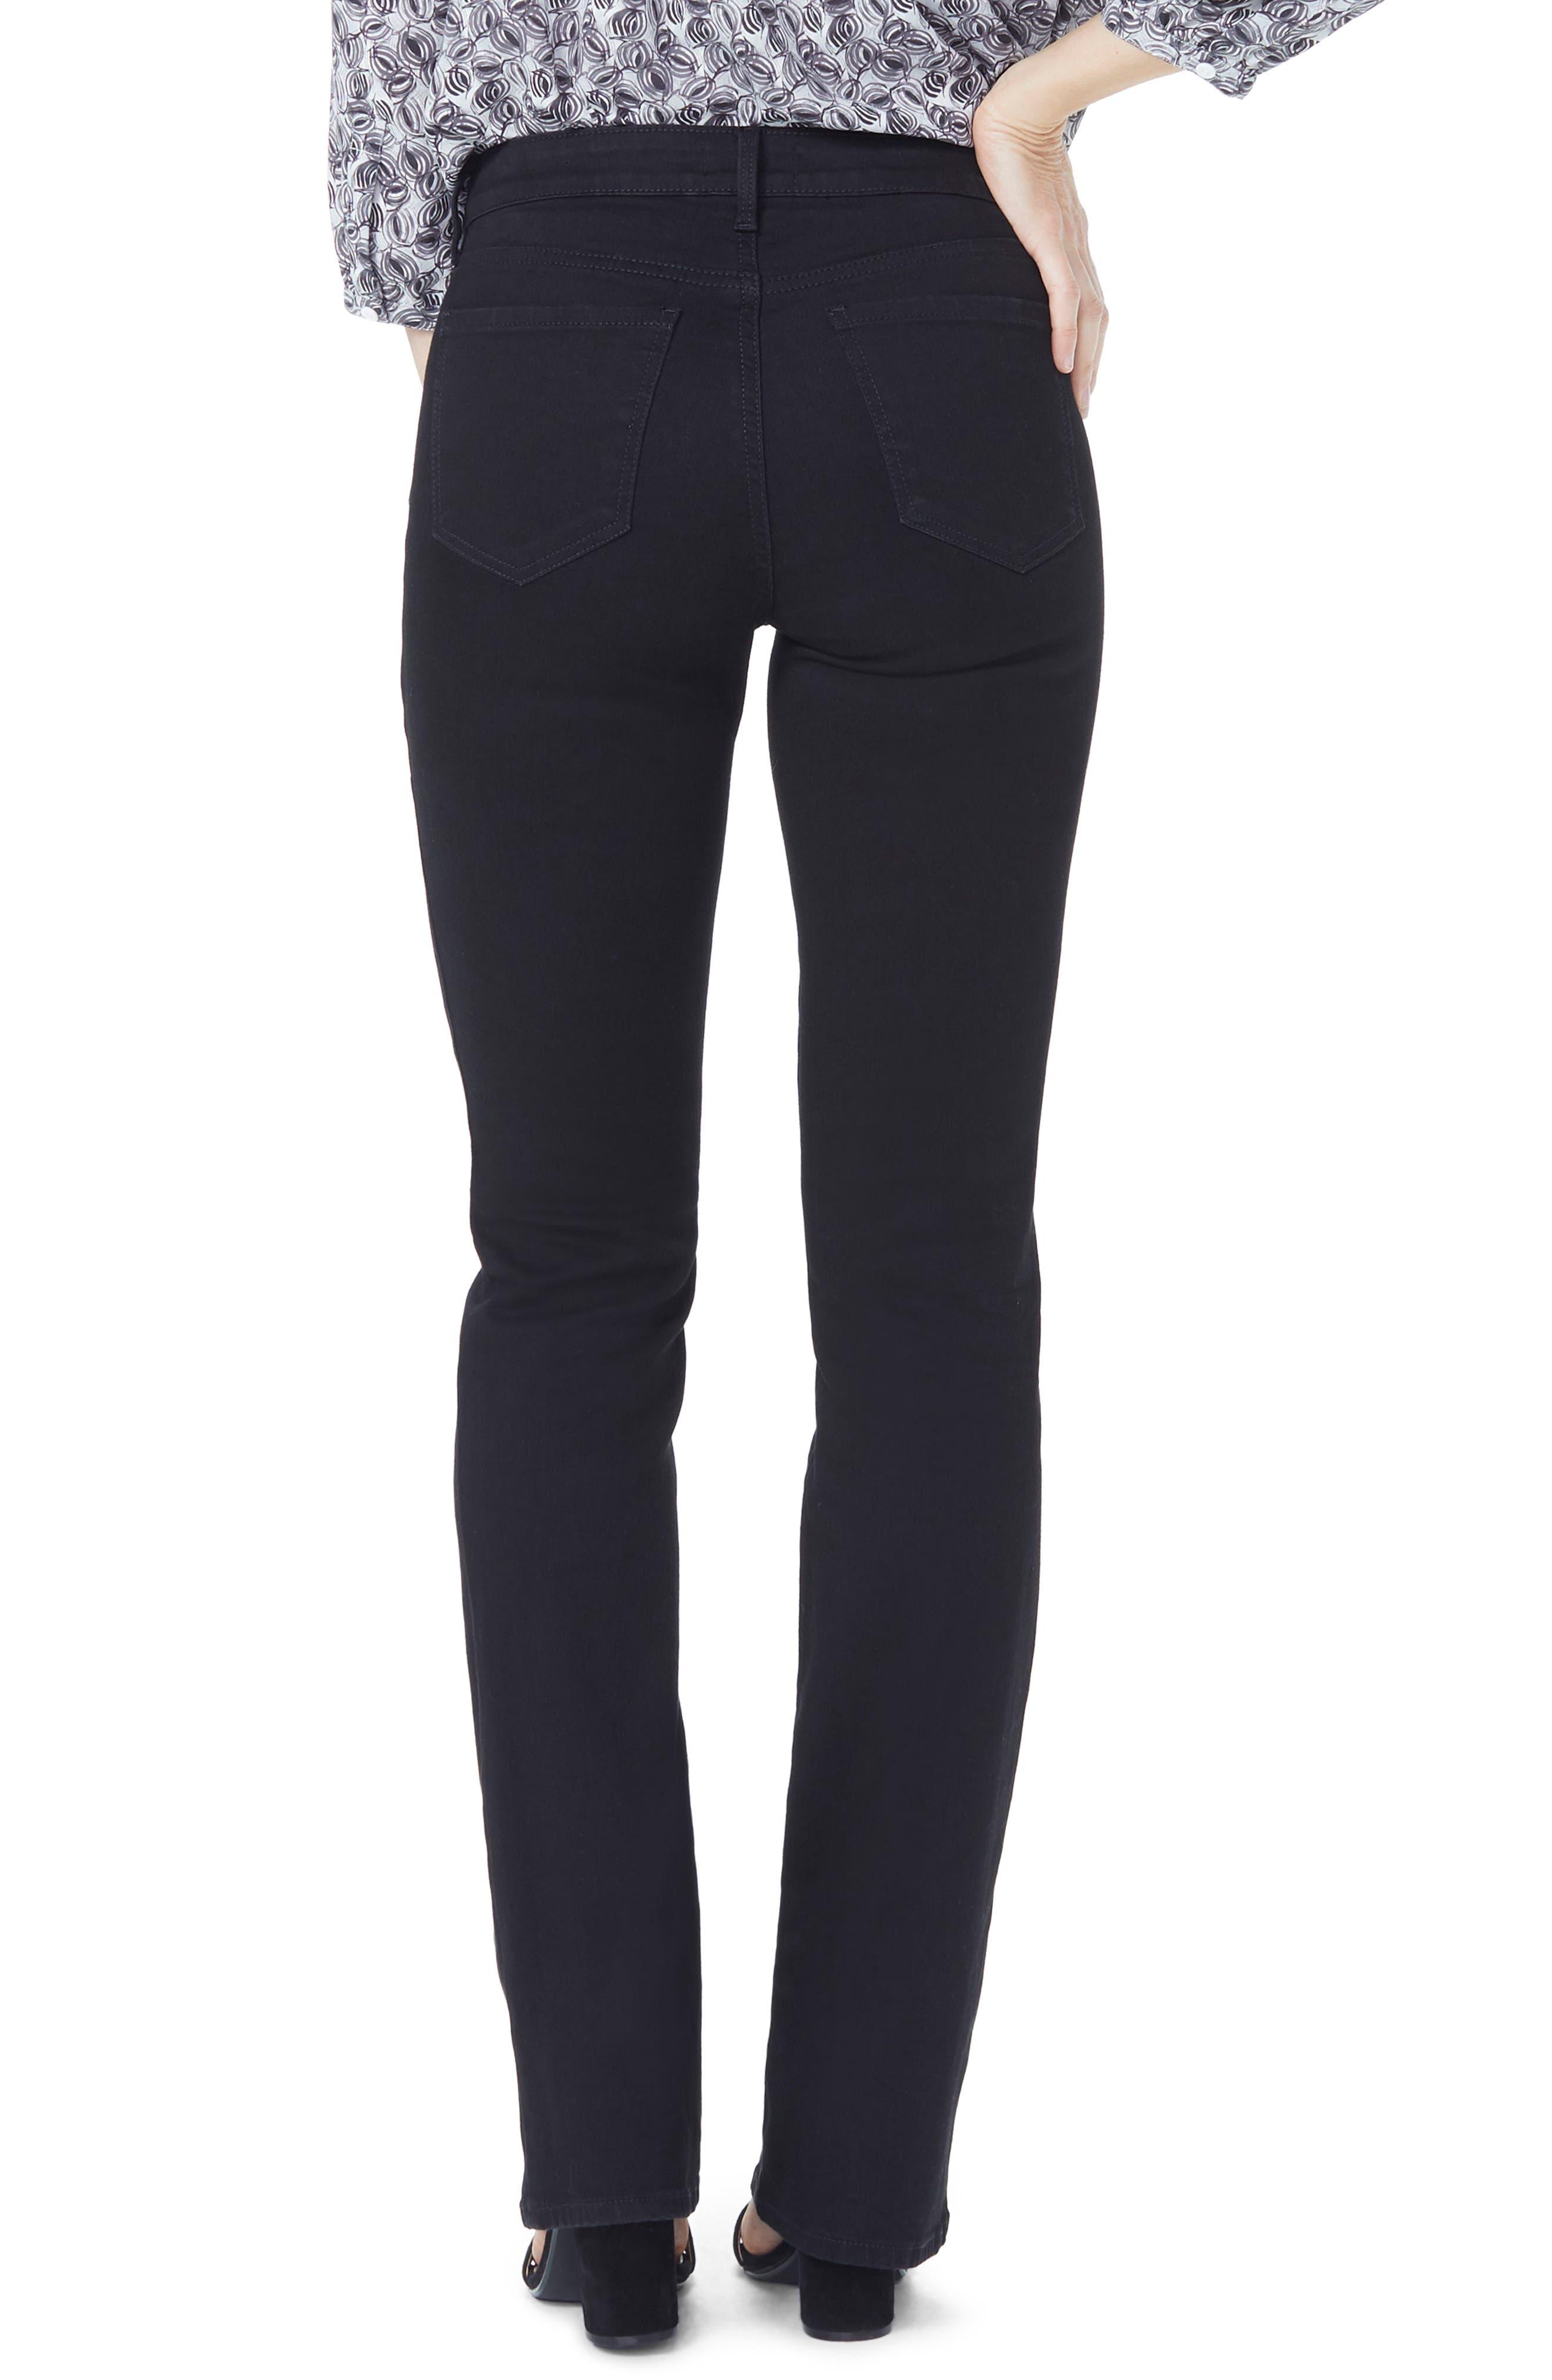 Barbara High Waist Stretch Bootcut Jeans,                             Alternate thumbnail 2, color,                             BLACK